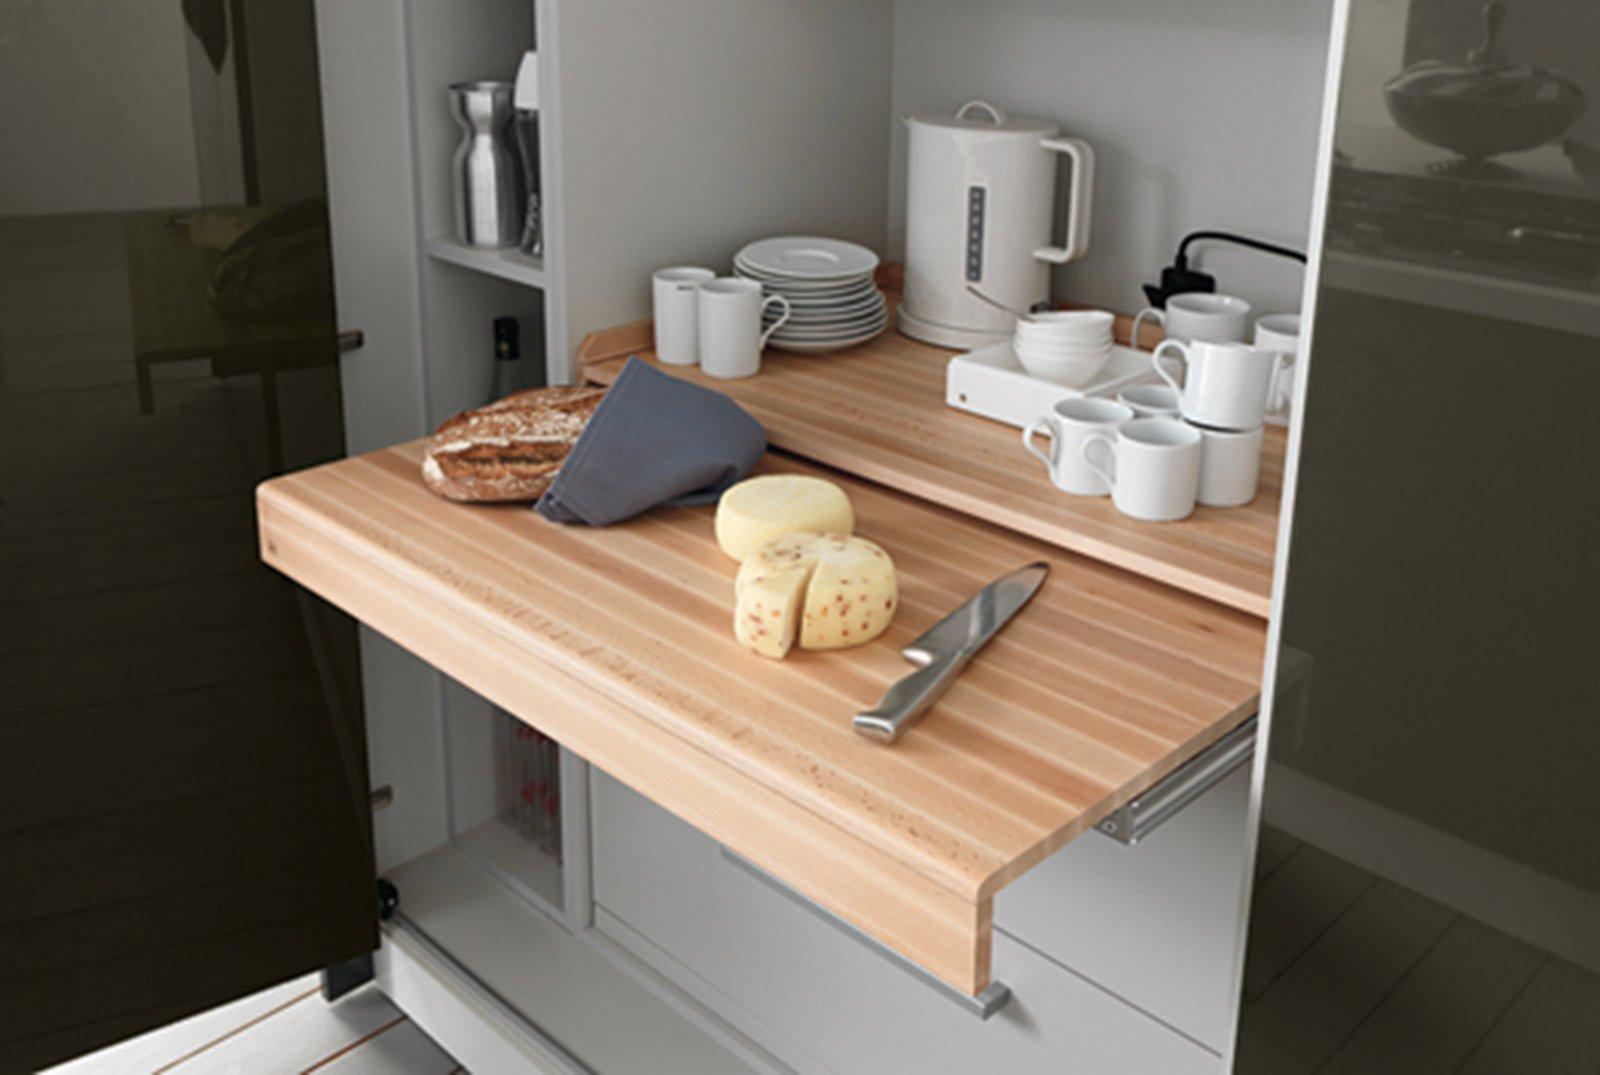 Guide per mobili cucina design casa creativa e mobili - Mobili x cucina ...